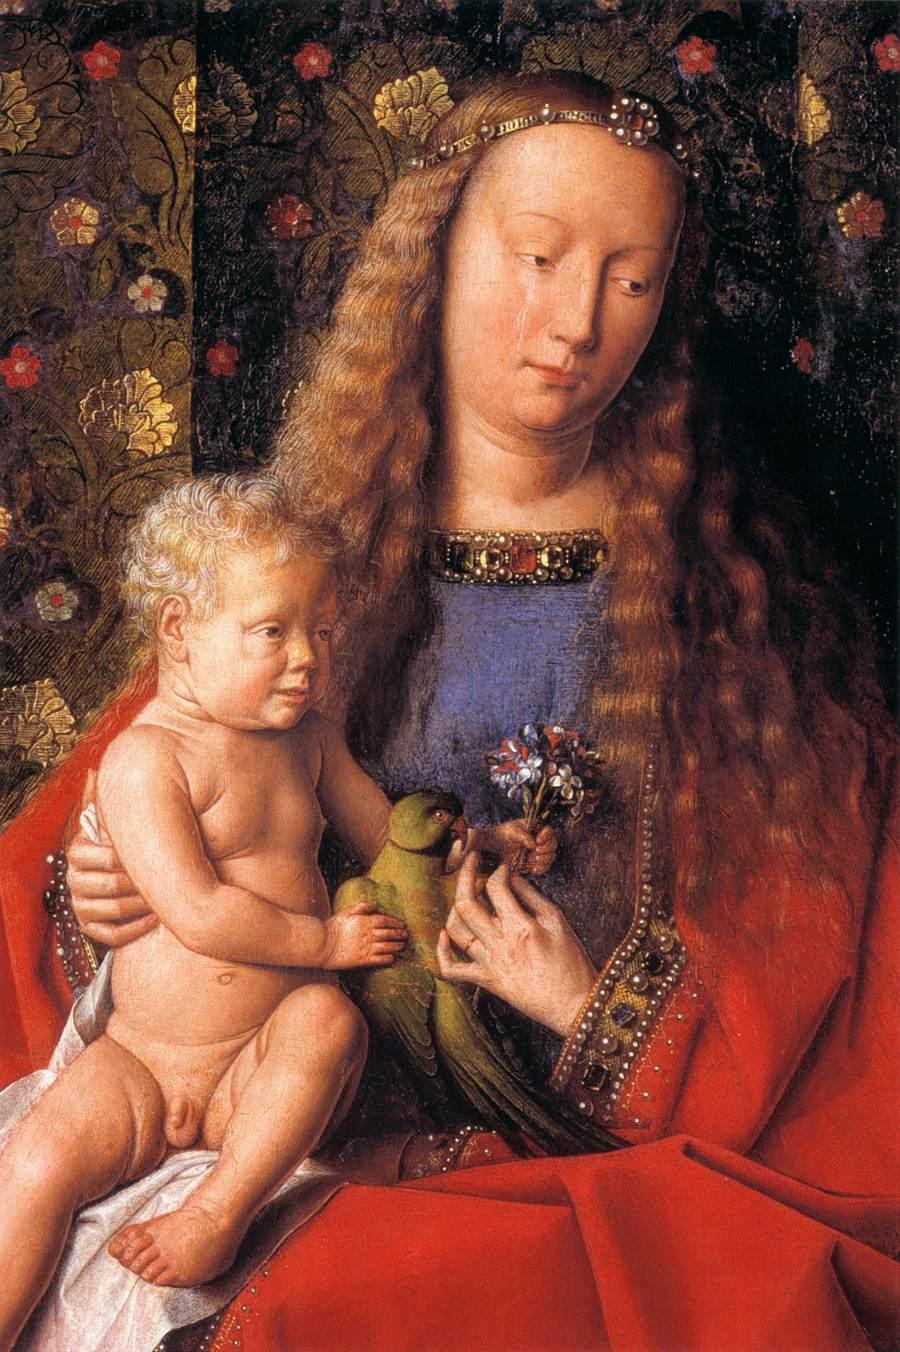 van-eyck-kanonikus-van-der-paele-madonna-christuskind-papagei